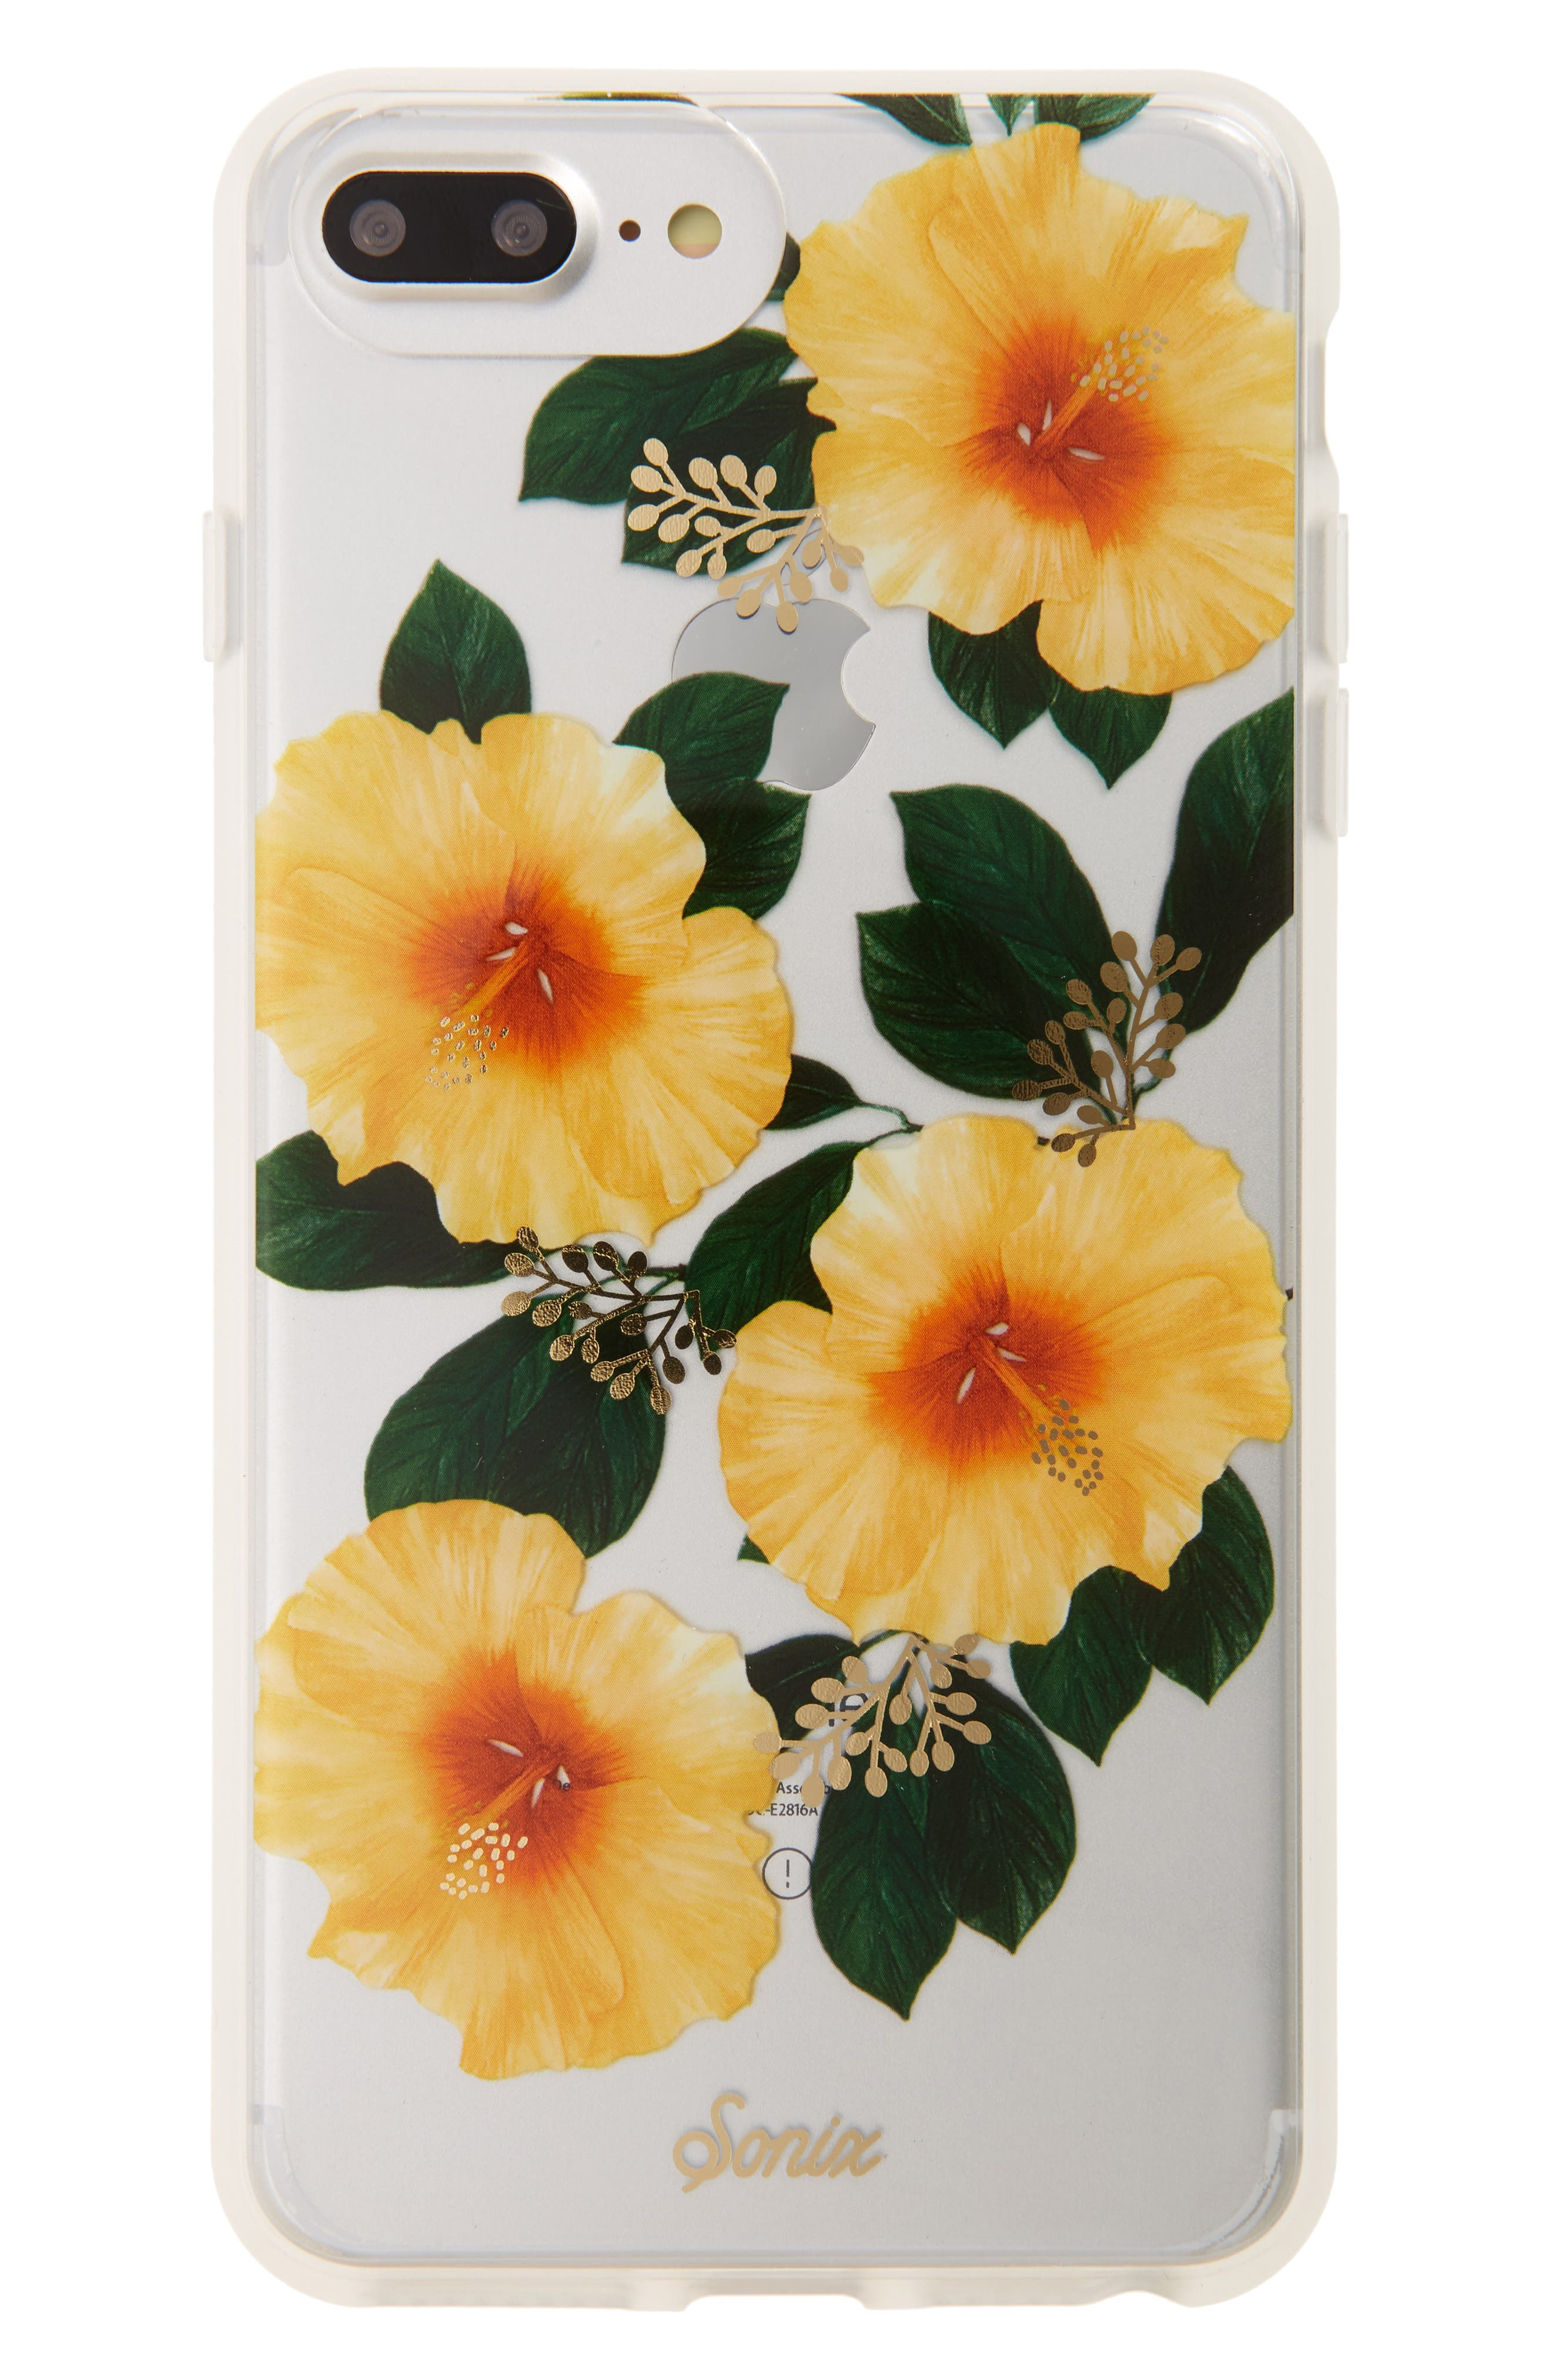 Hibiscus iPhone 6/6s/7/8 & 6/6s/7/8 Plus Case,                             Main thumbnail 1, color,                             700